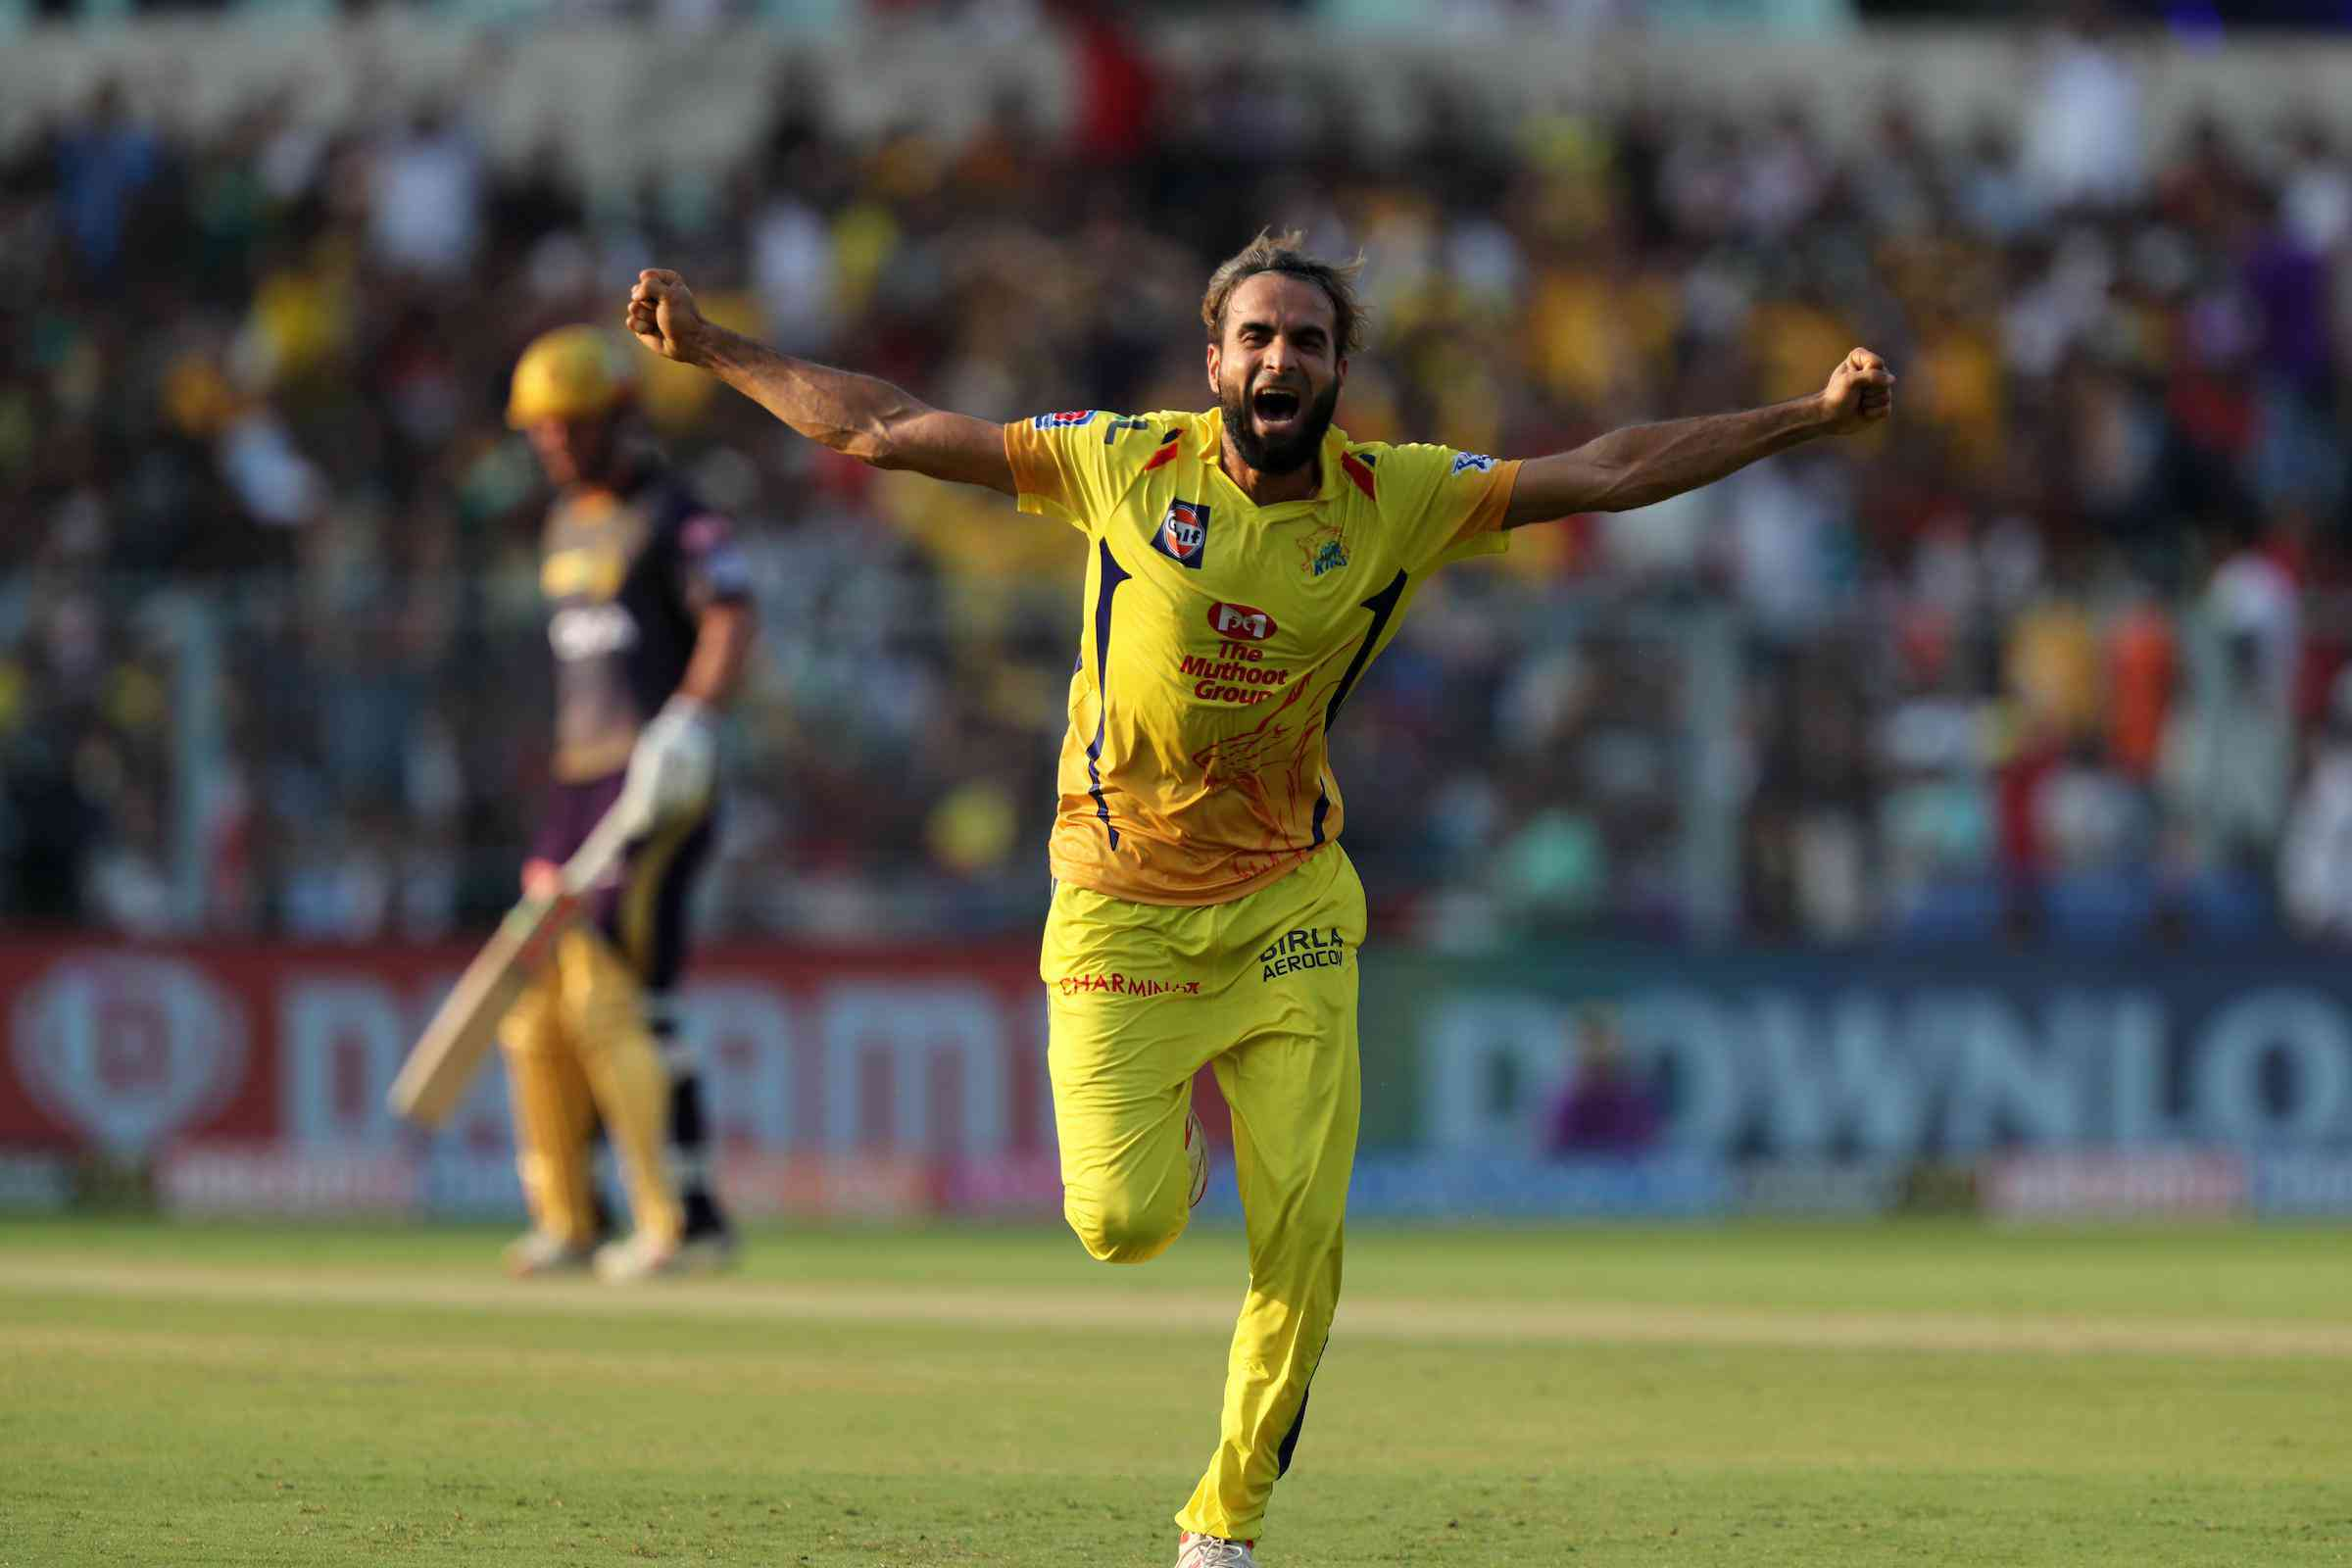 Prashant Bhoot/Sportzpics